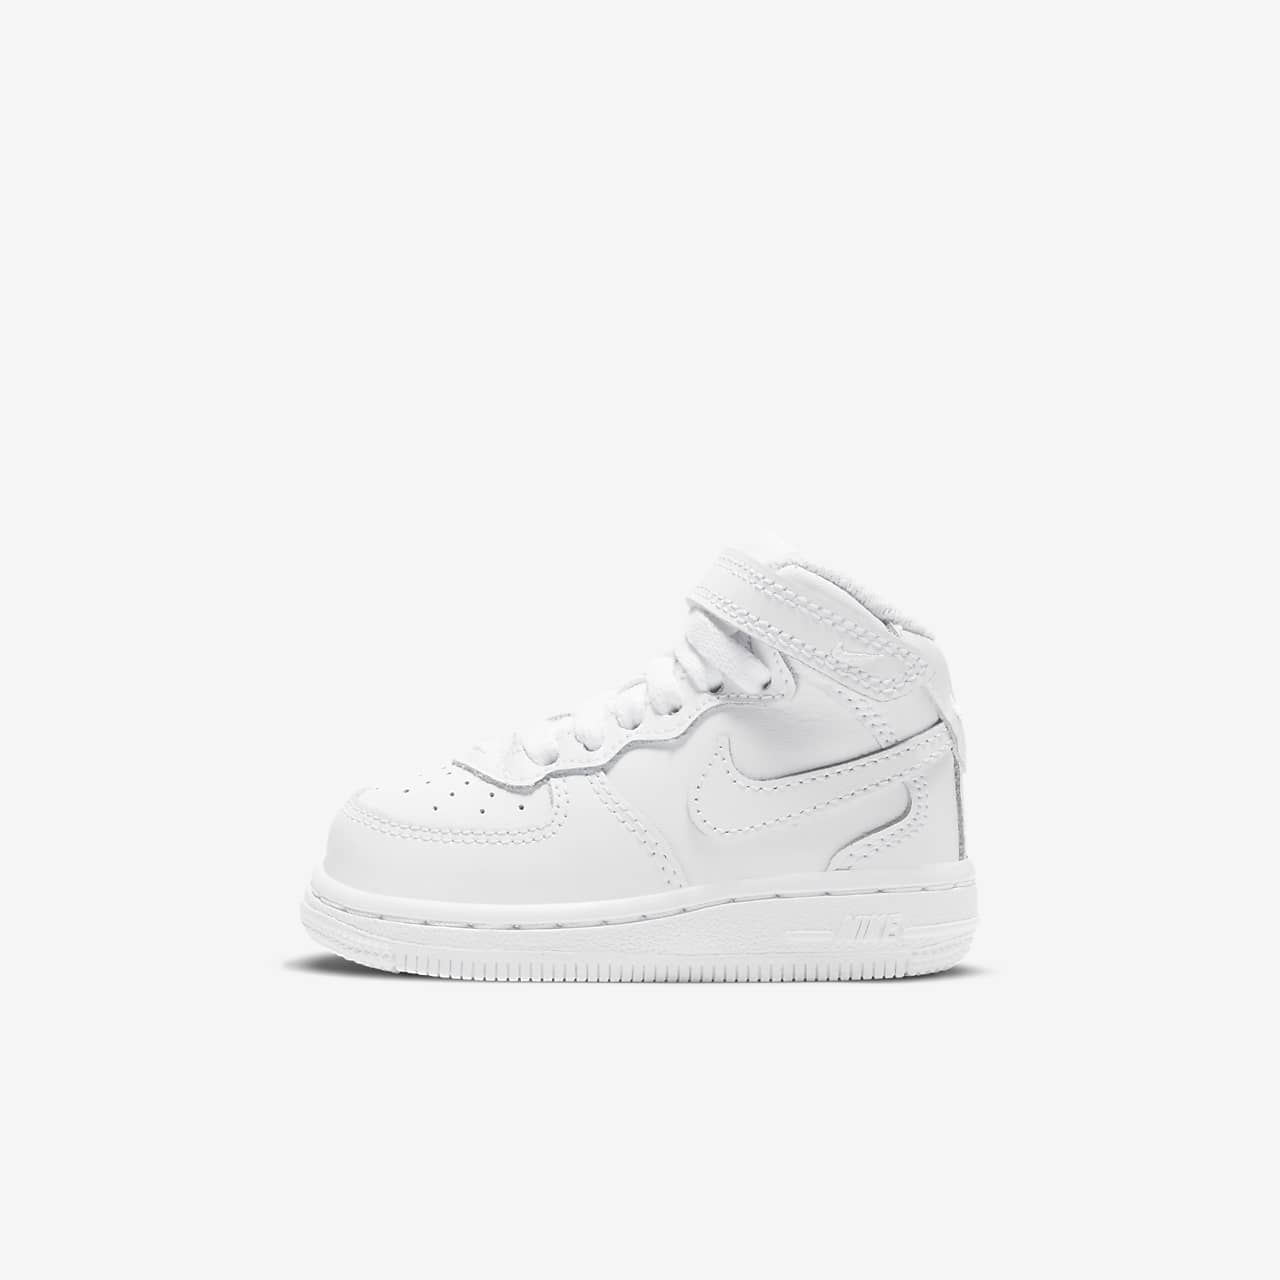 Nike Air Force 1 Mid Kleinkinderschuh